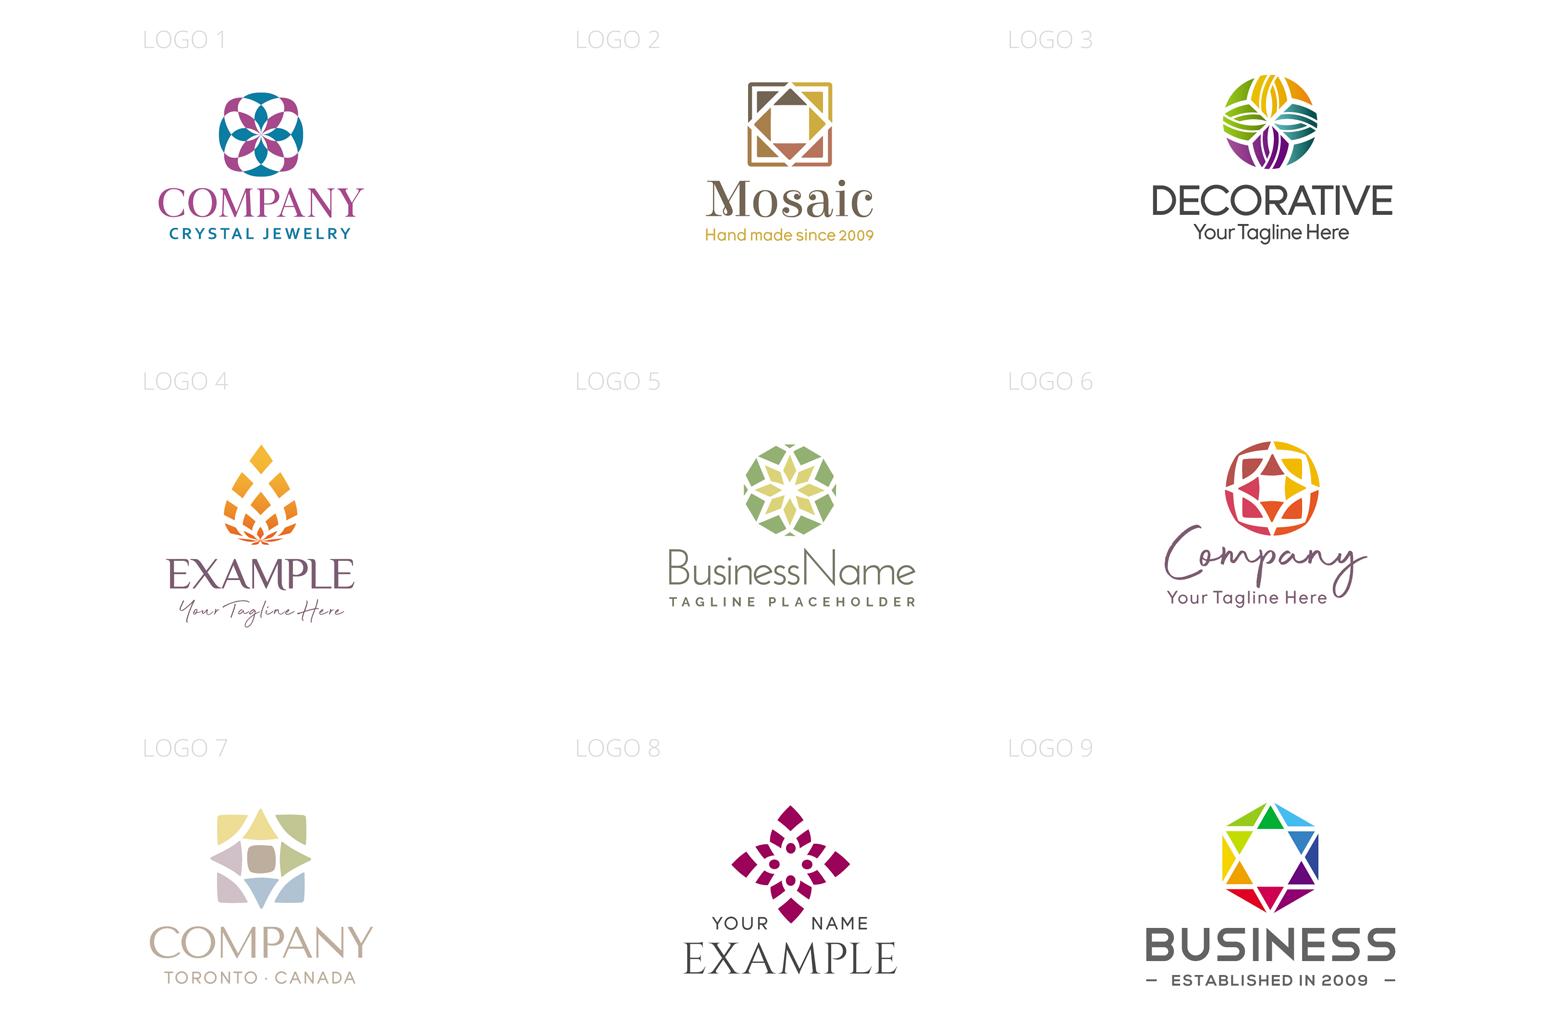 Mosaic & Fragmental Logo Design Set example image 2